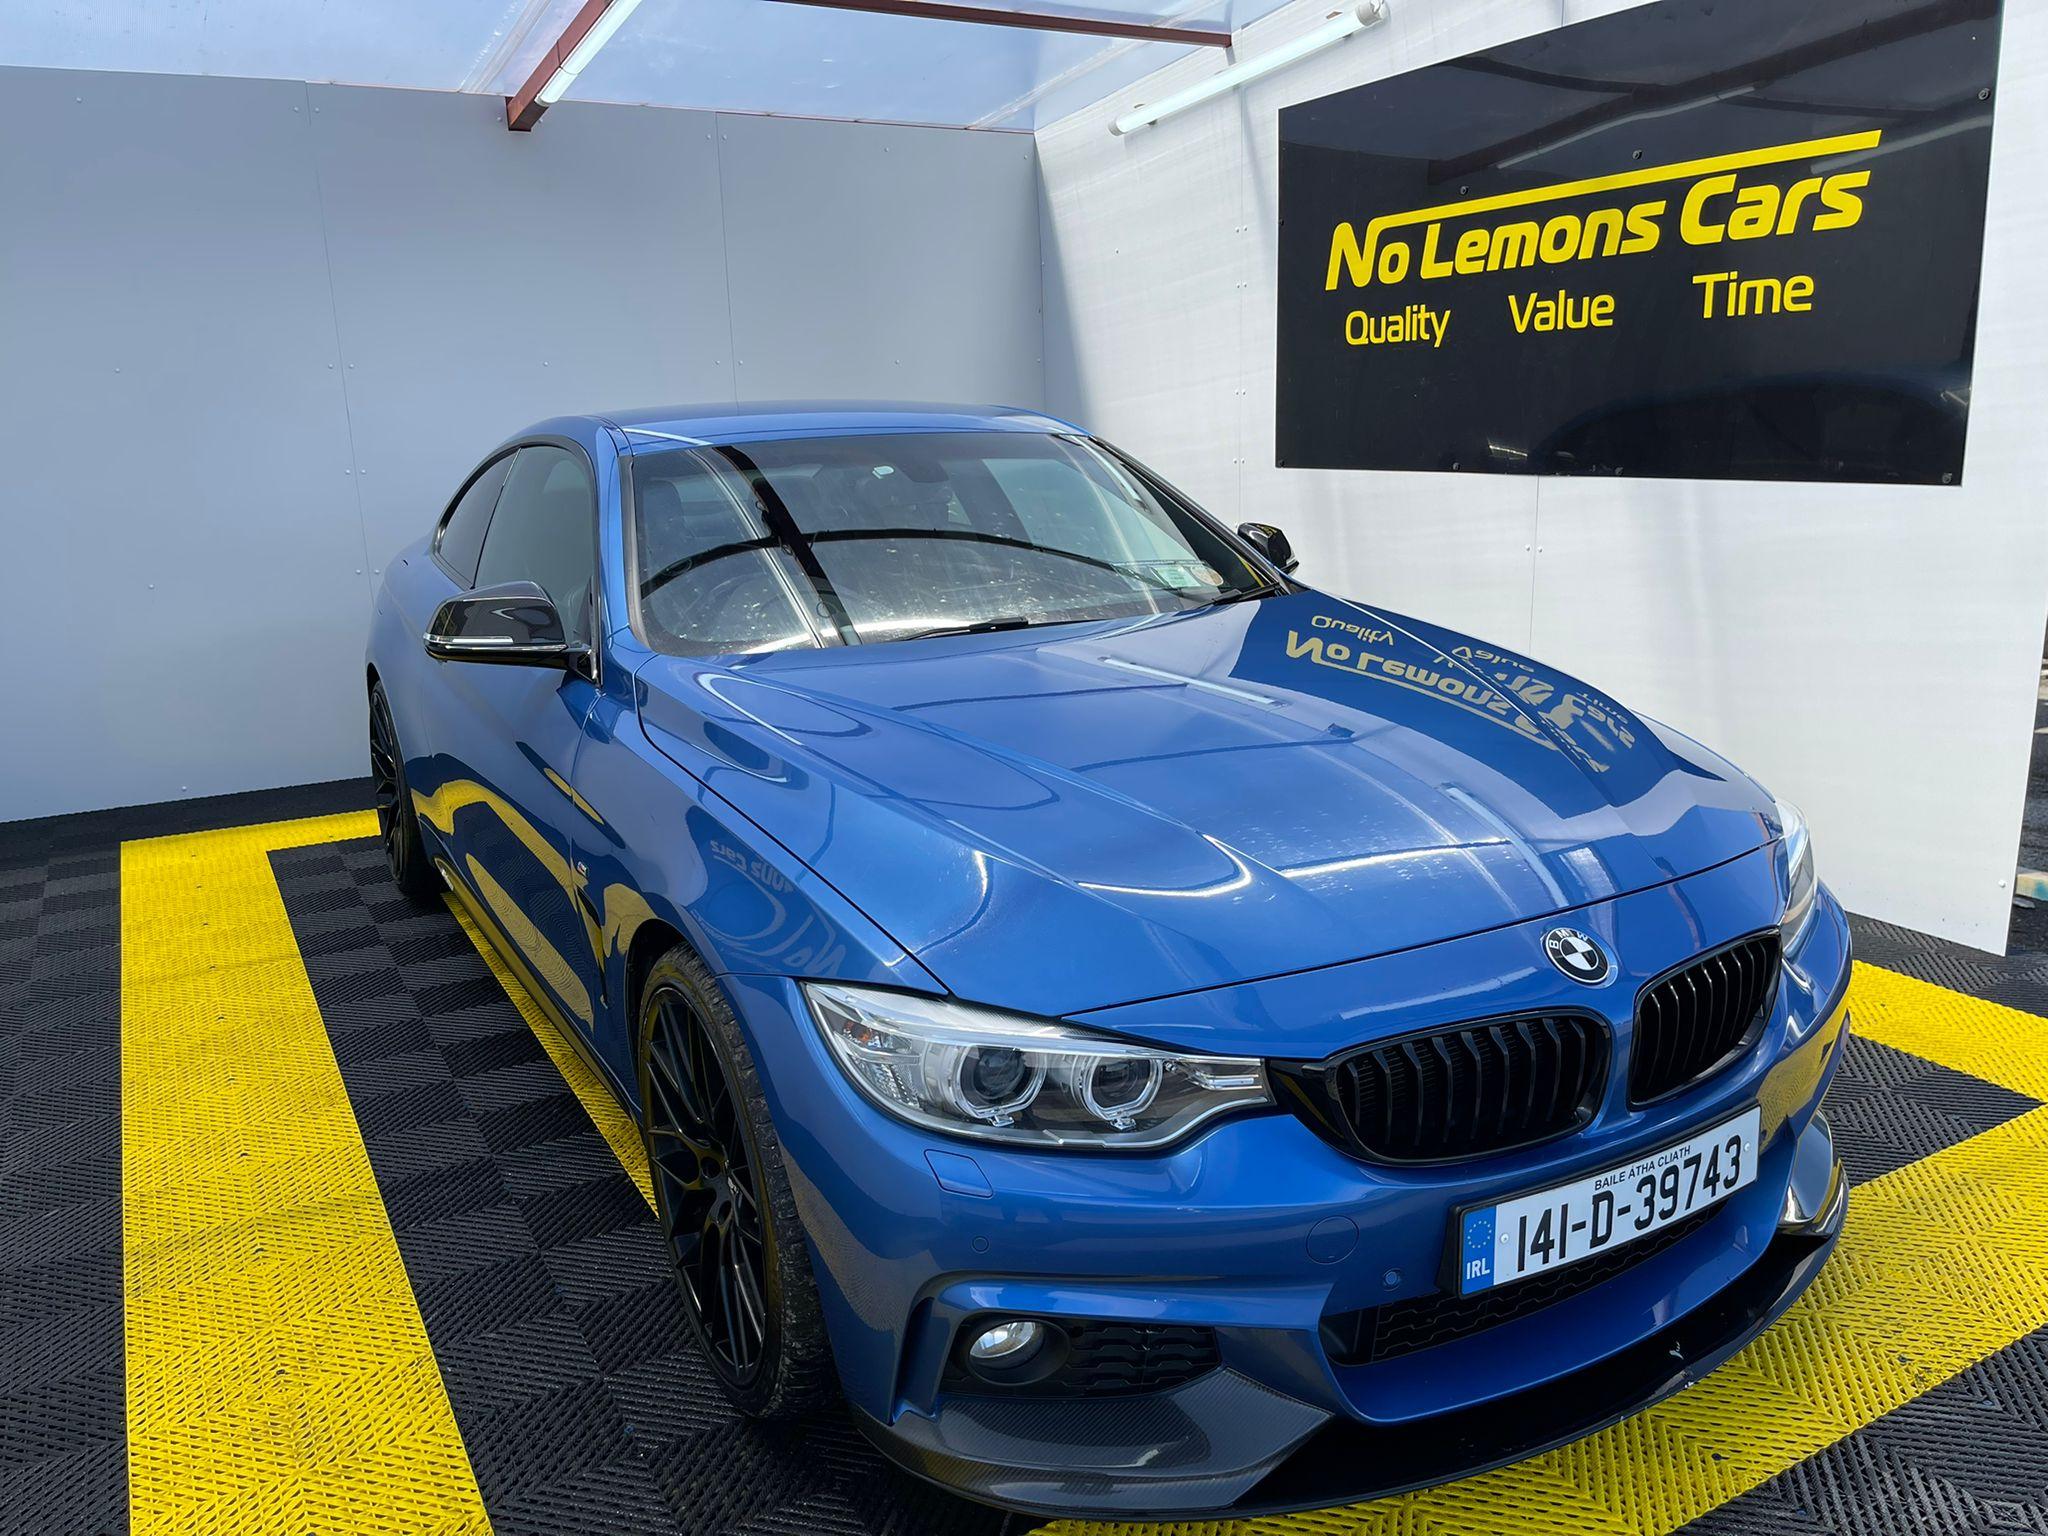 BMW 4 Series M-Sport 2014 2.0